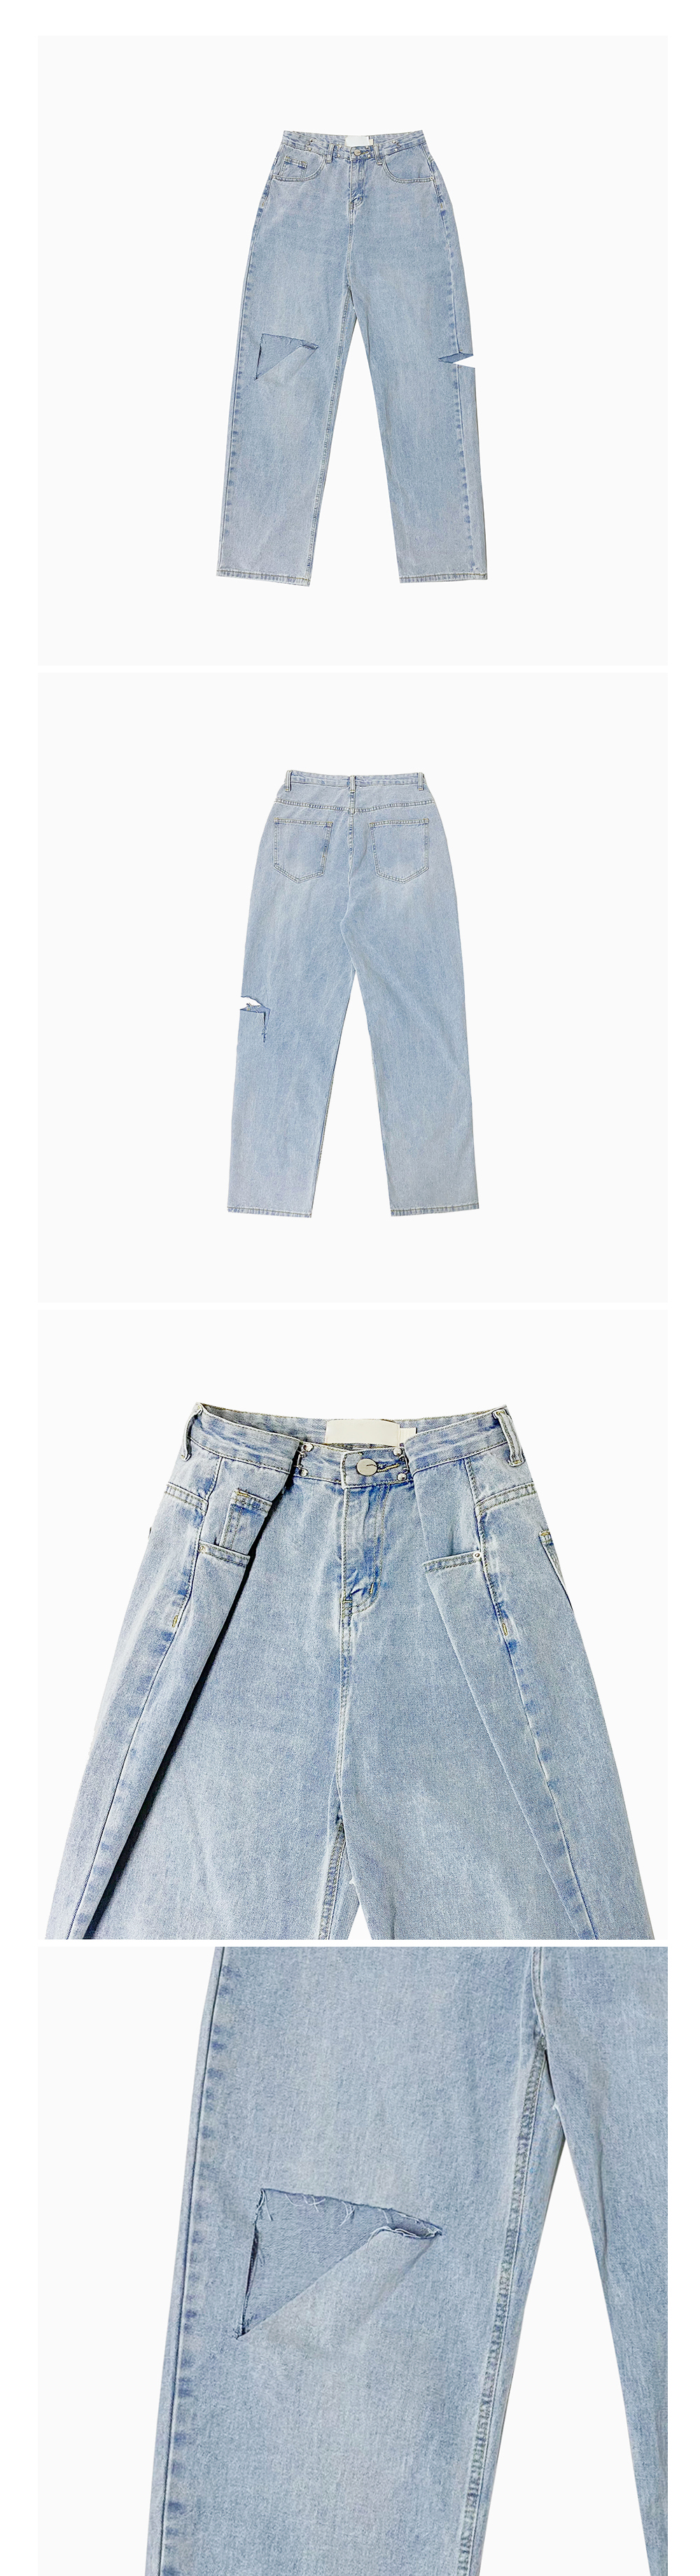 Damage Buckle Wide Pants